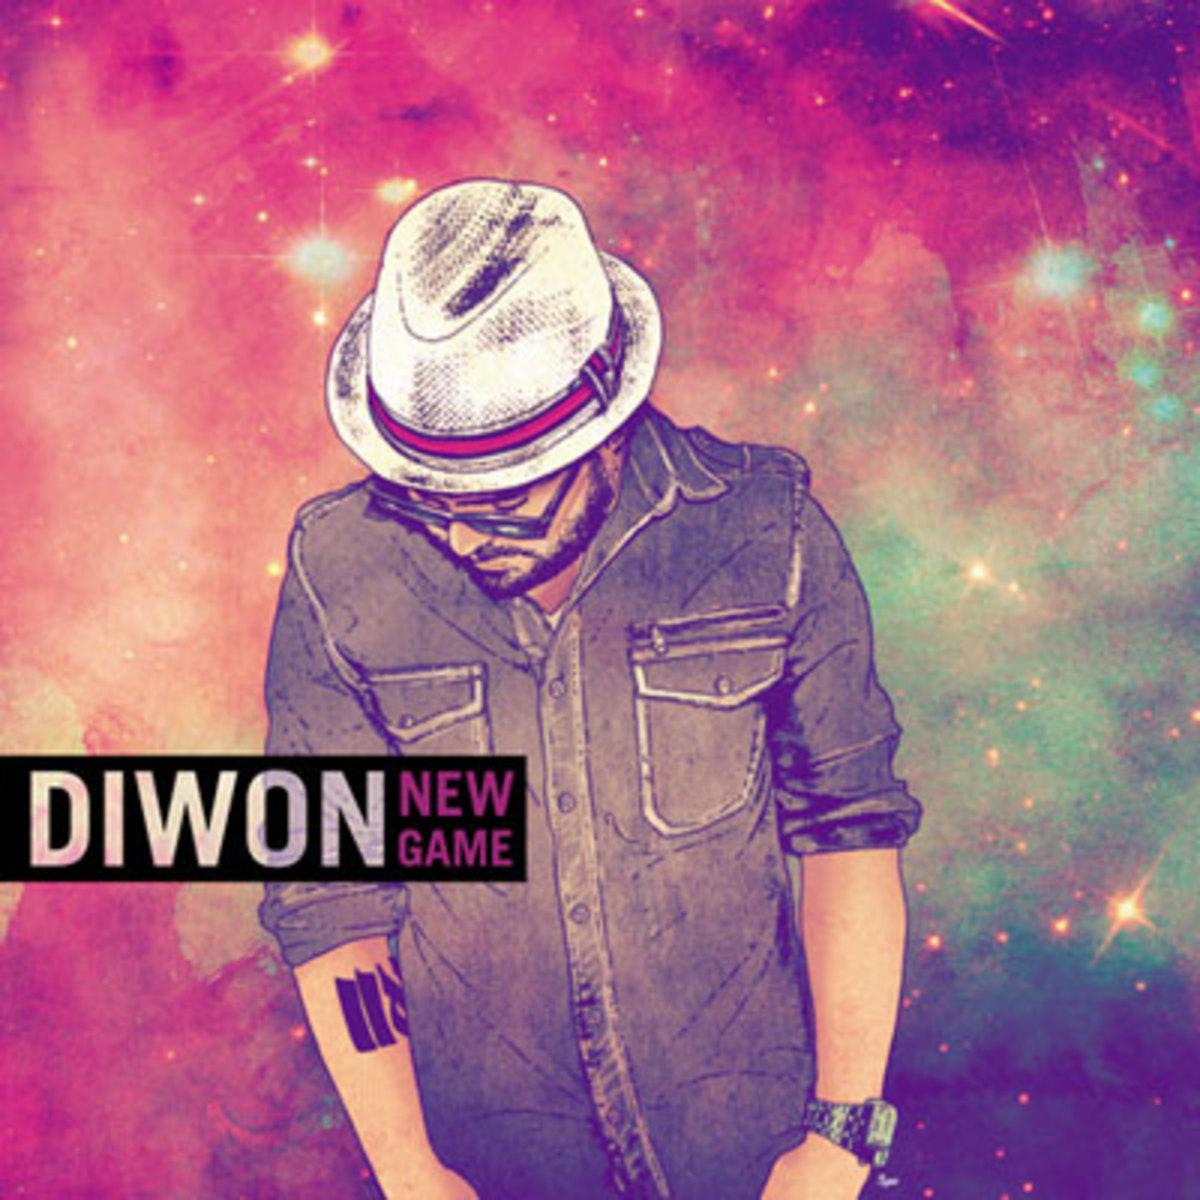 diwon-newgame.jpg